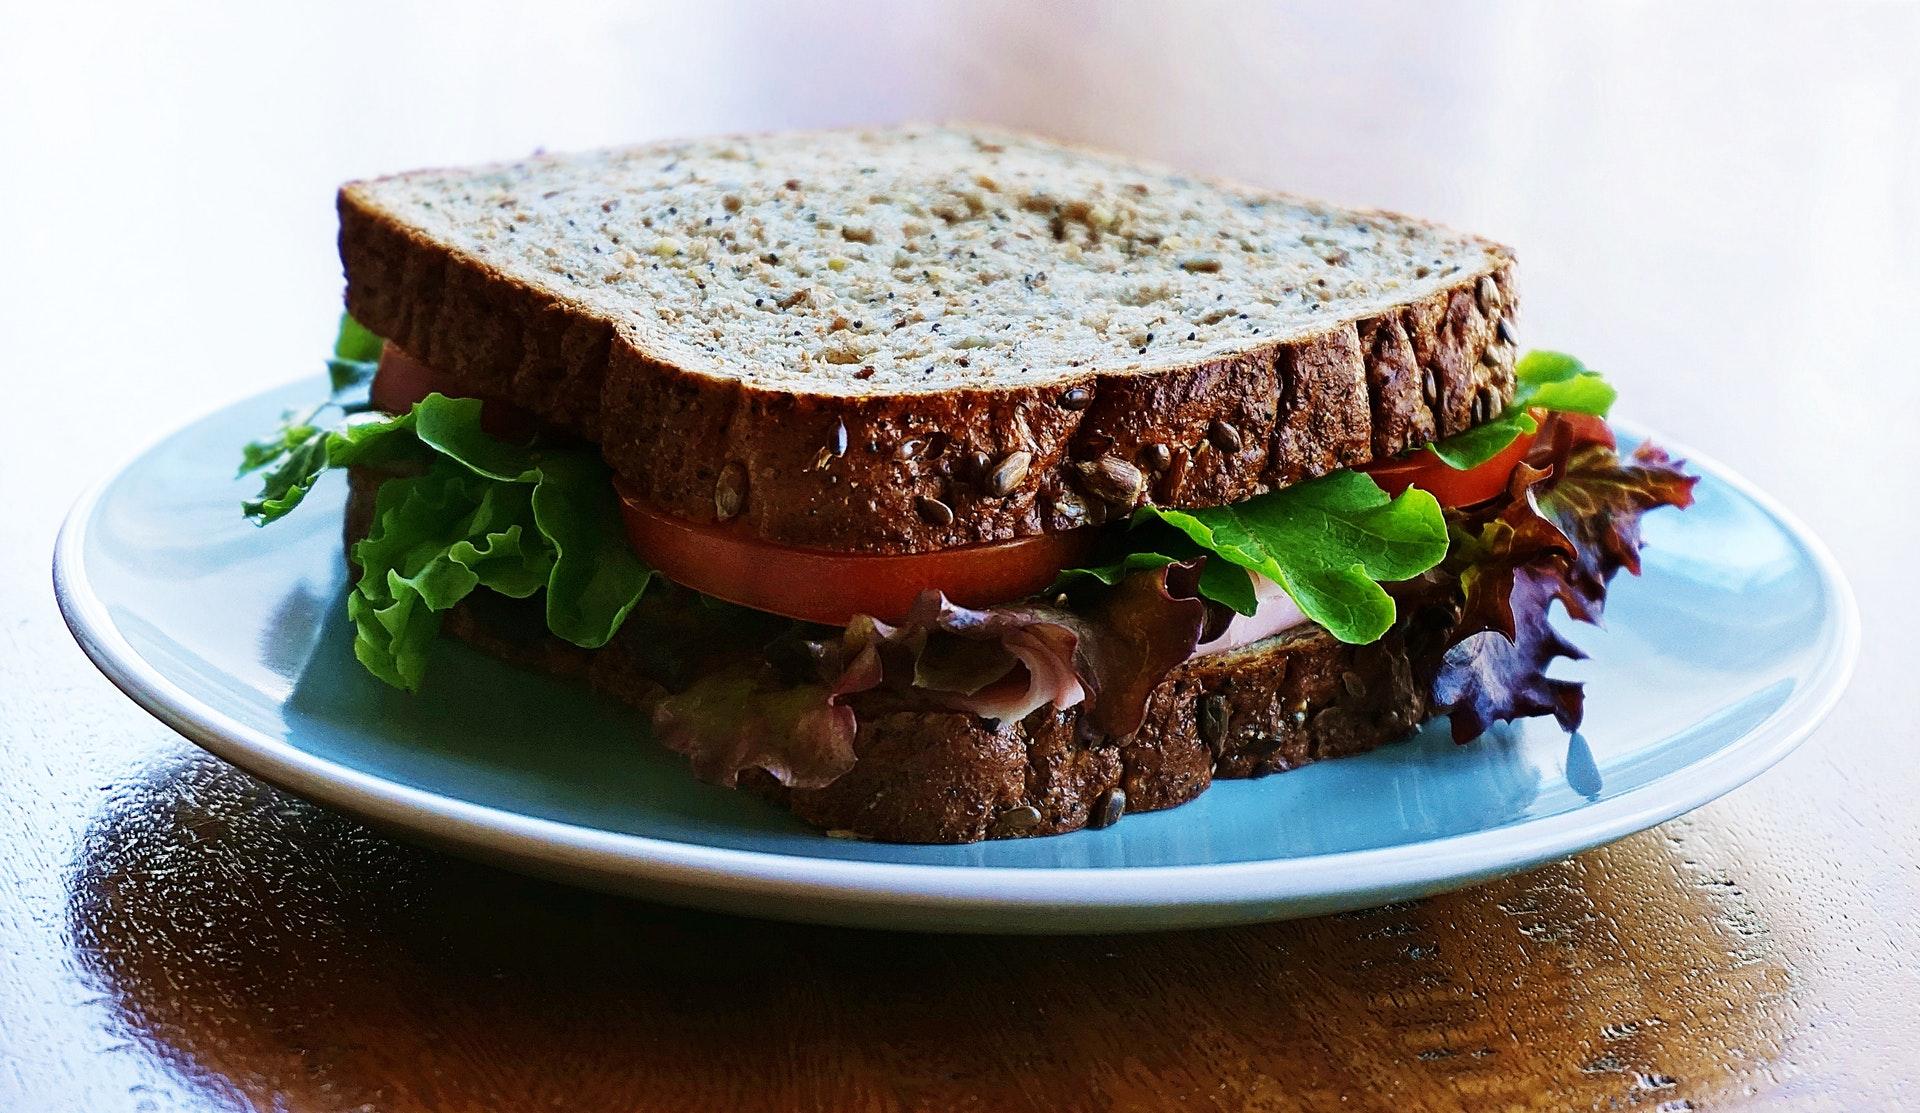 A Rogue Device Sandwich